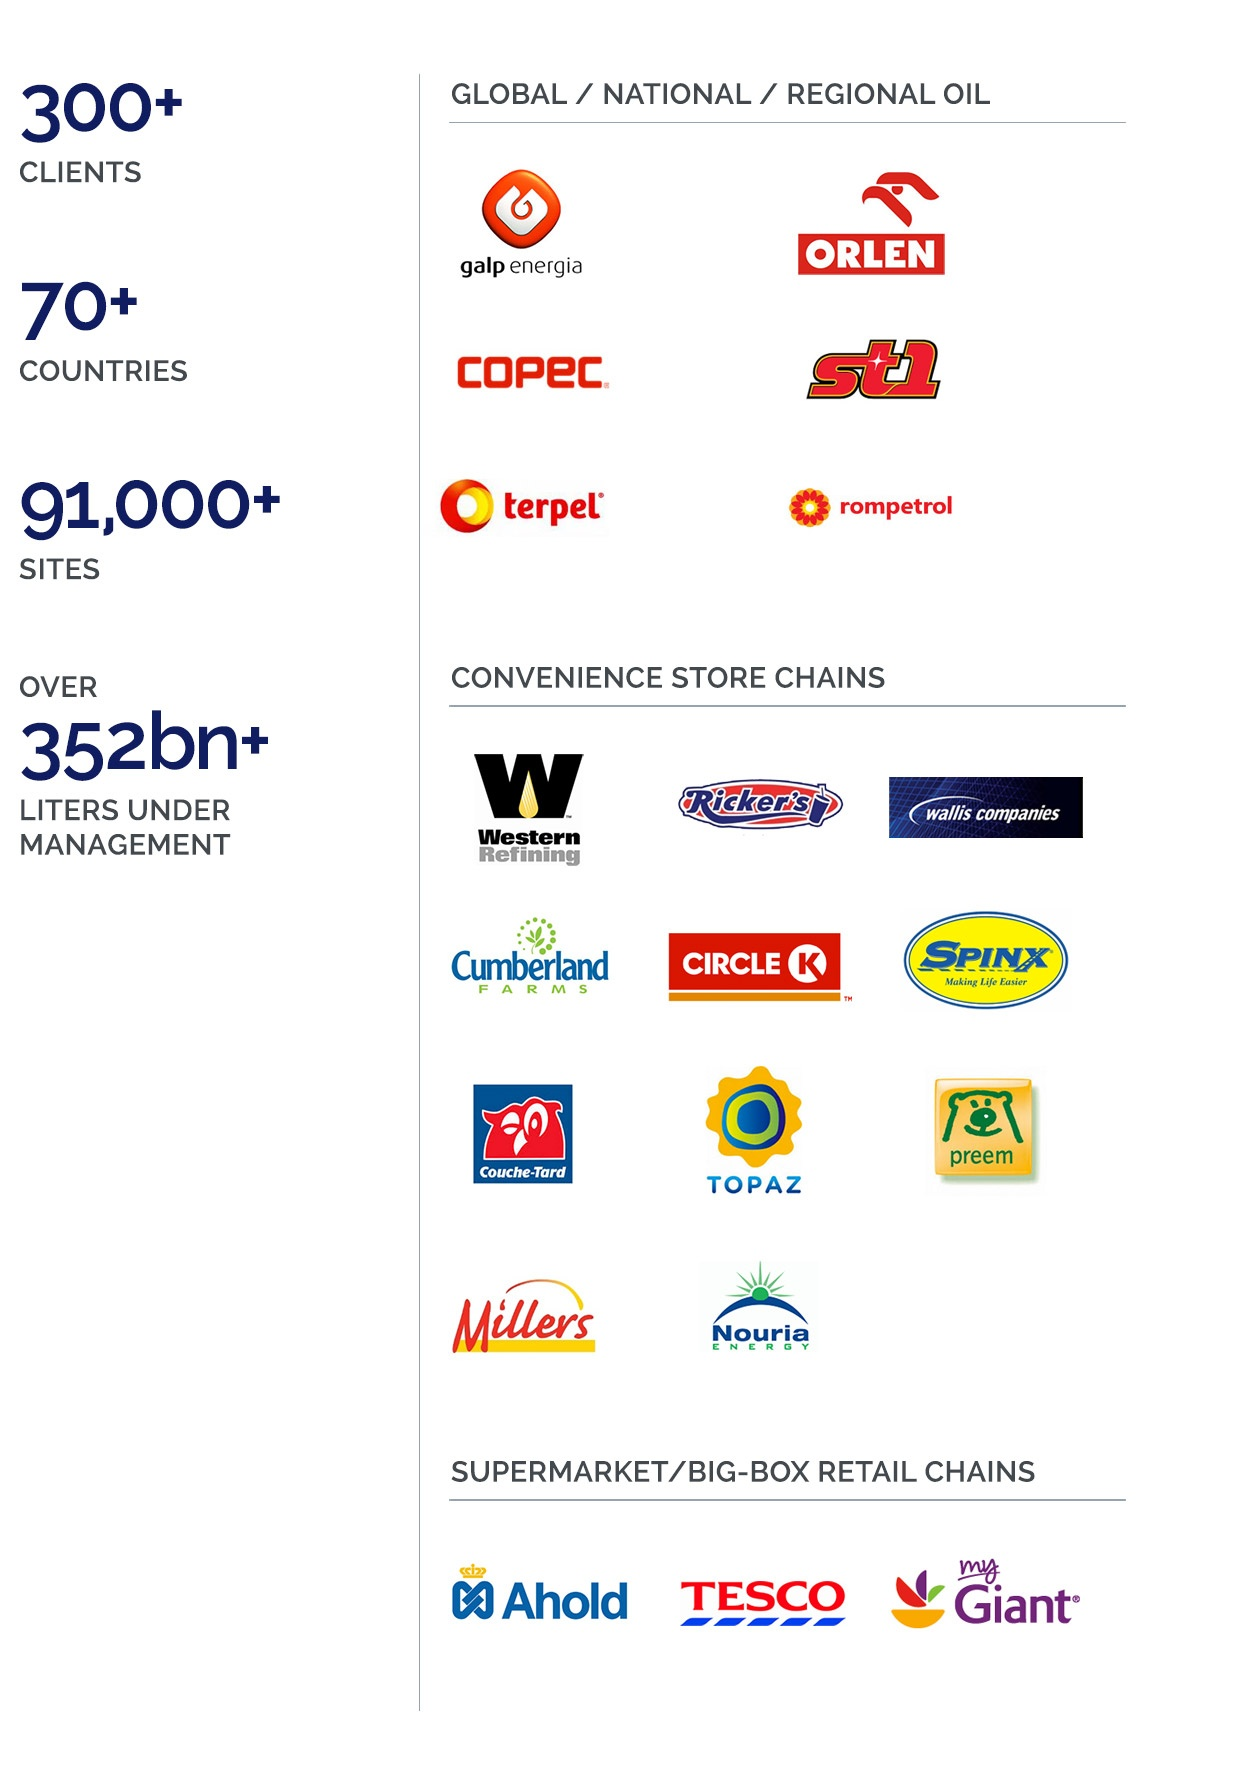 Kalibrate-global-footprint-clients-logos.jpg